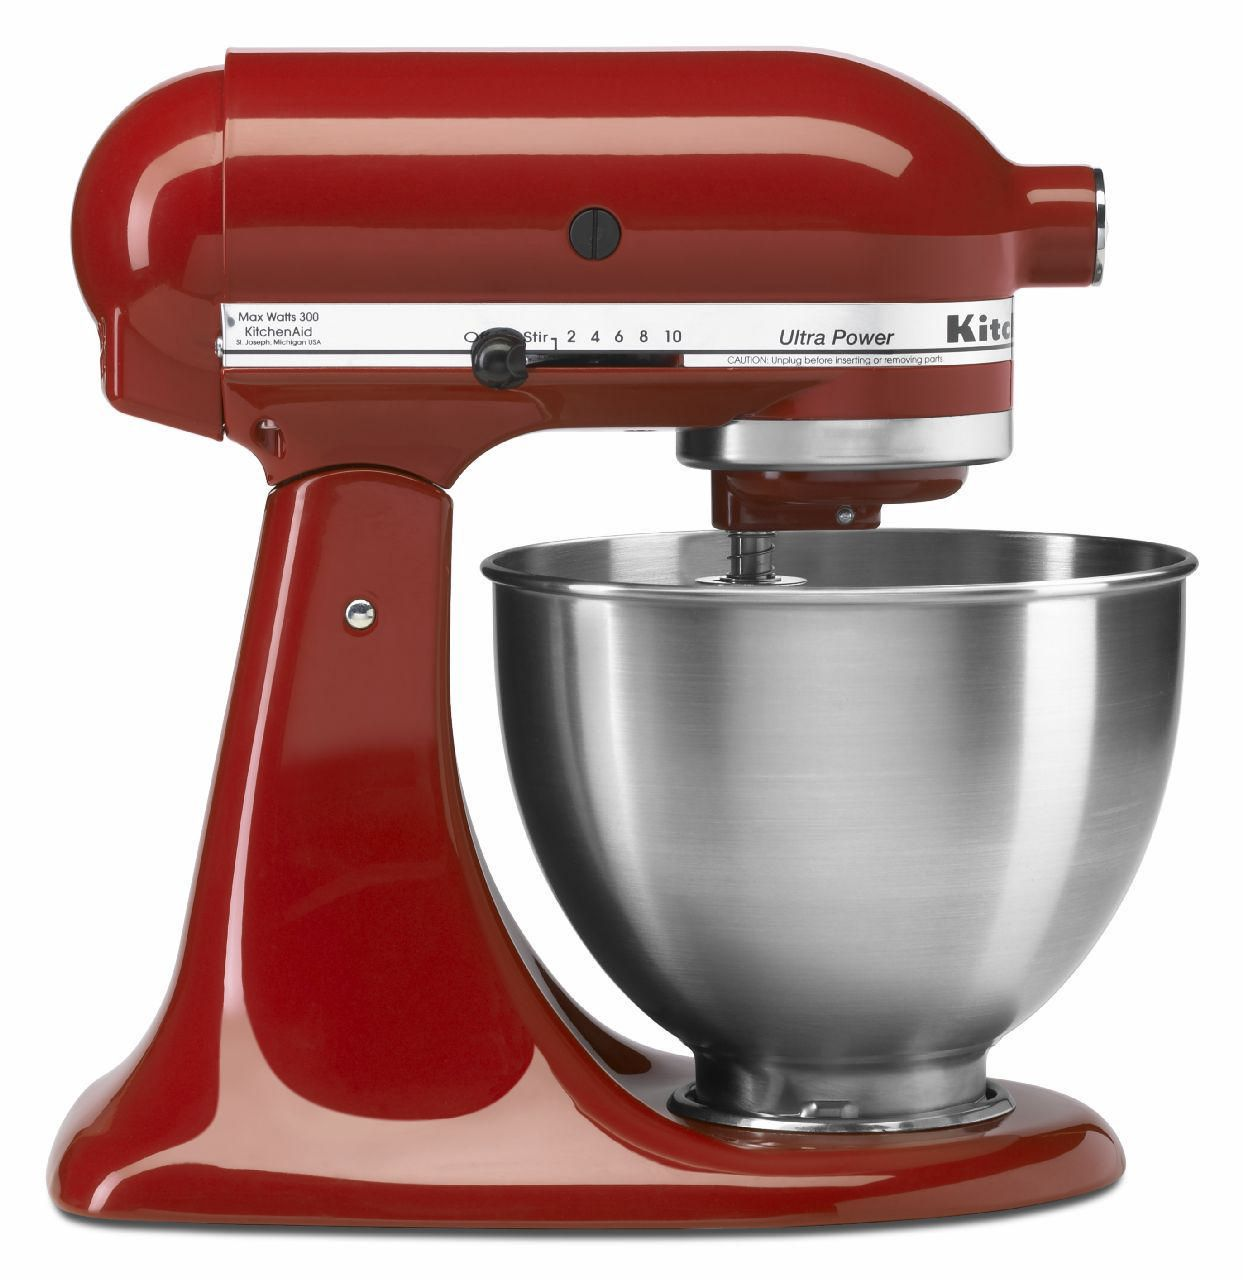 walmart kitchen aid mixer open metal shelving kitchenaid 300 watts ultra power stand canada